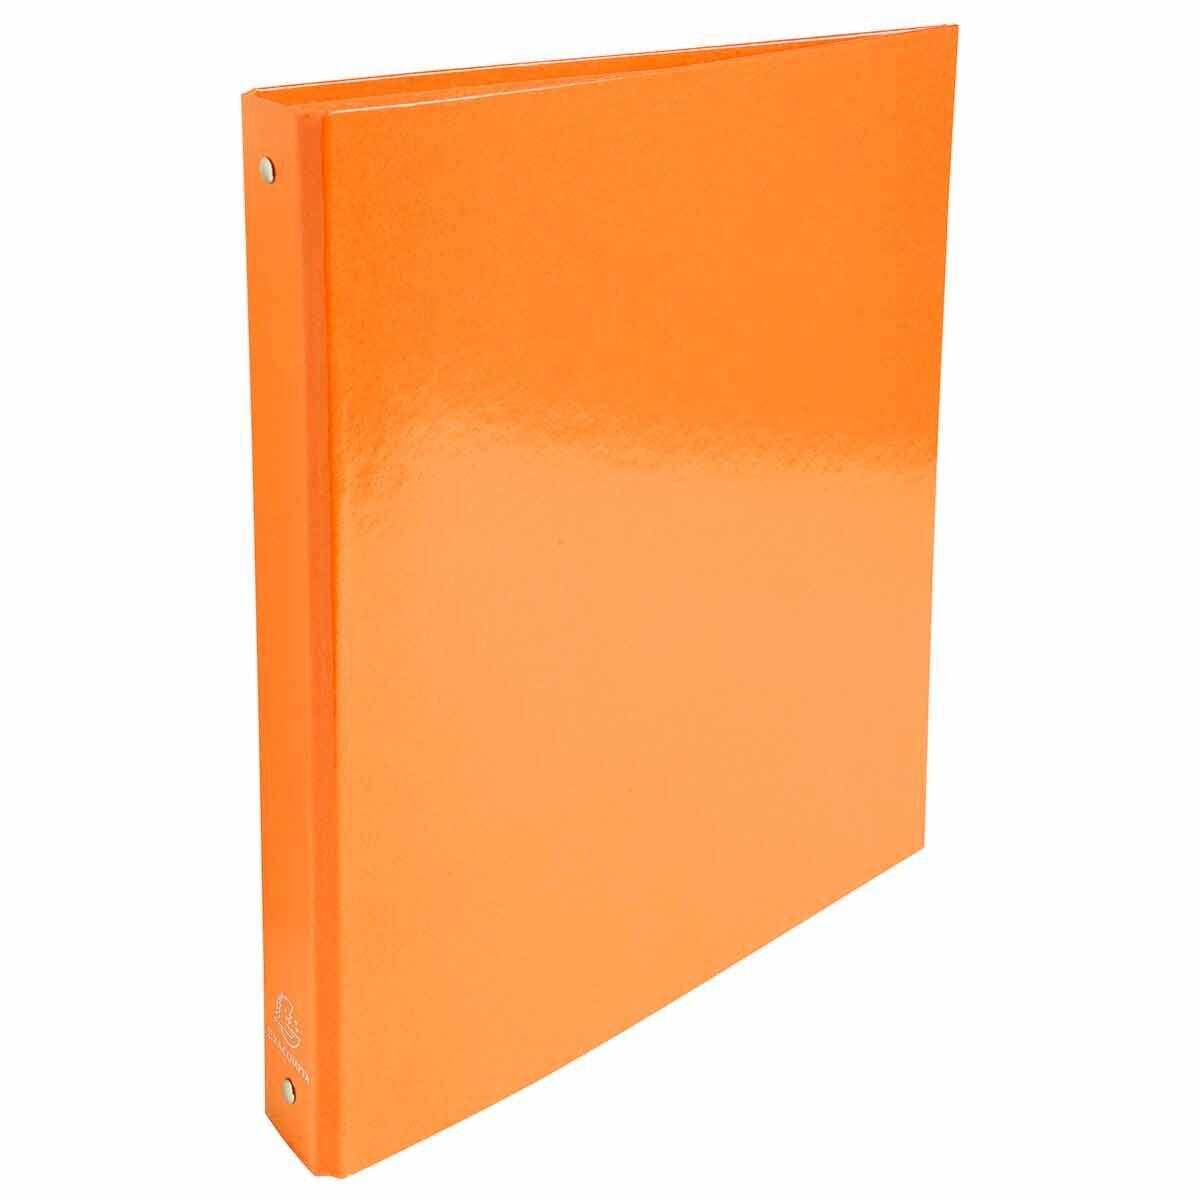 Exacompta Iderama Plastic Coated Ring Binder 4 Ring 30mm A4 Pack of 10 Orange